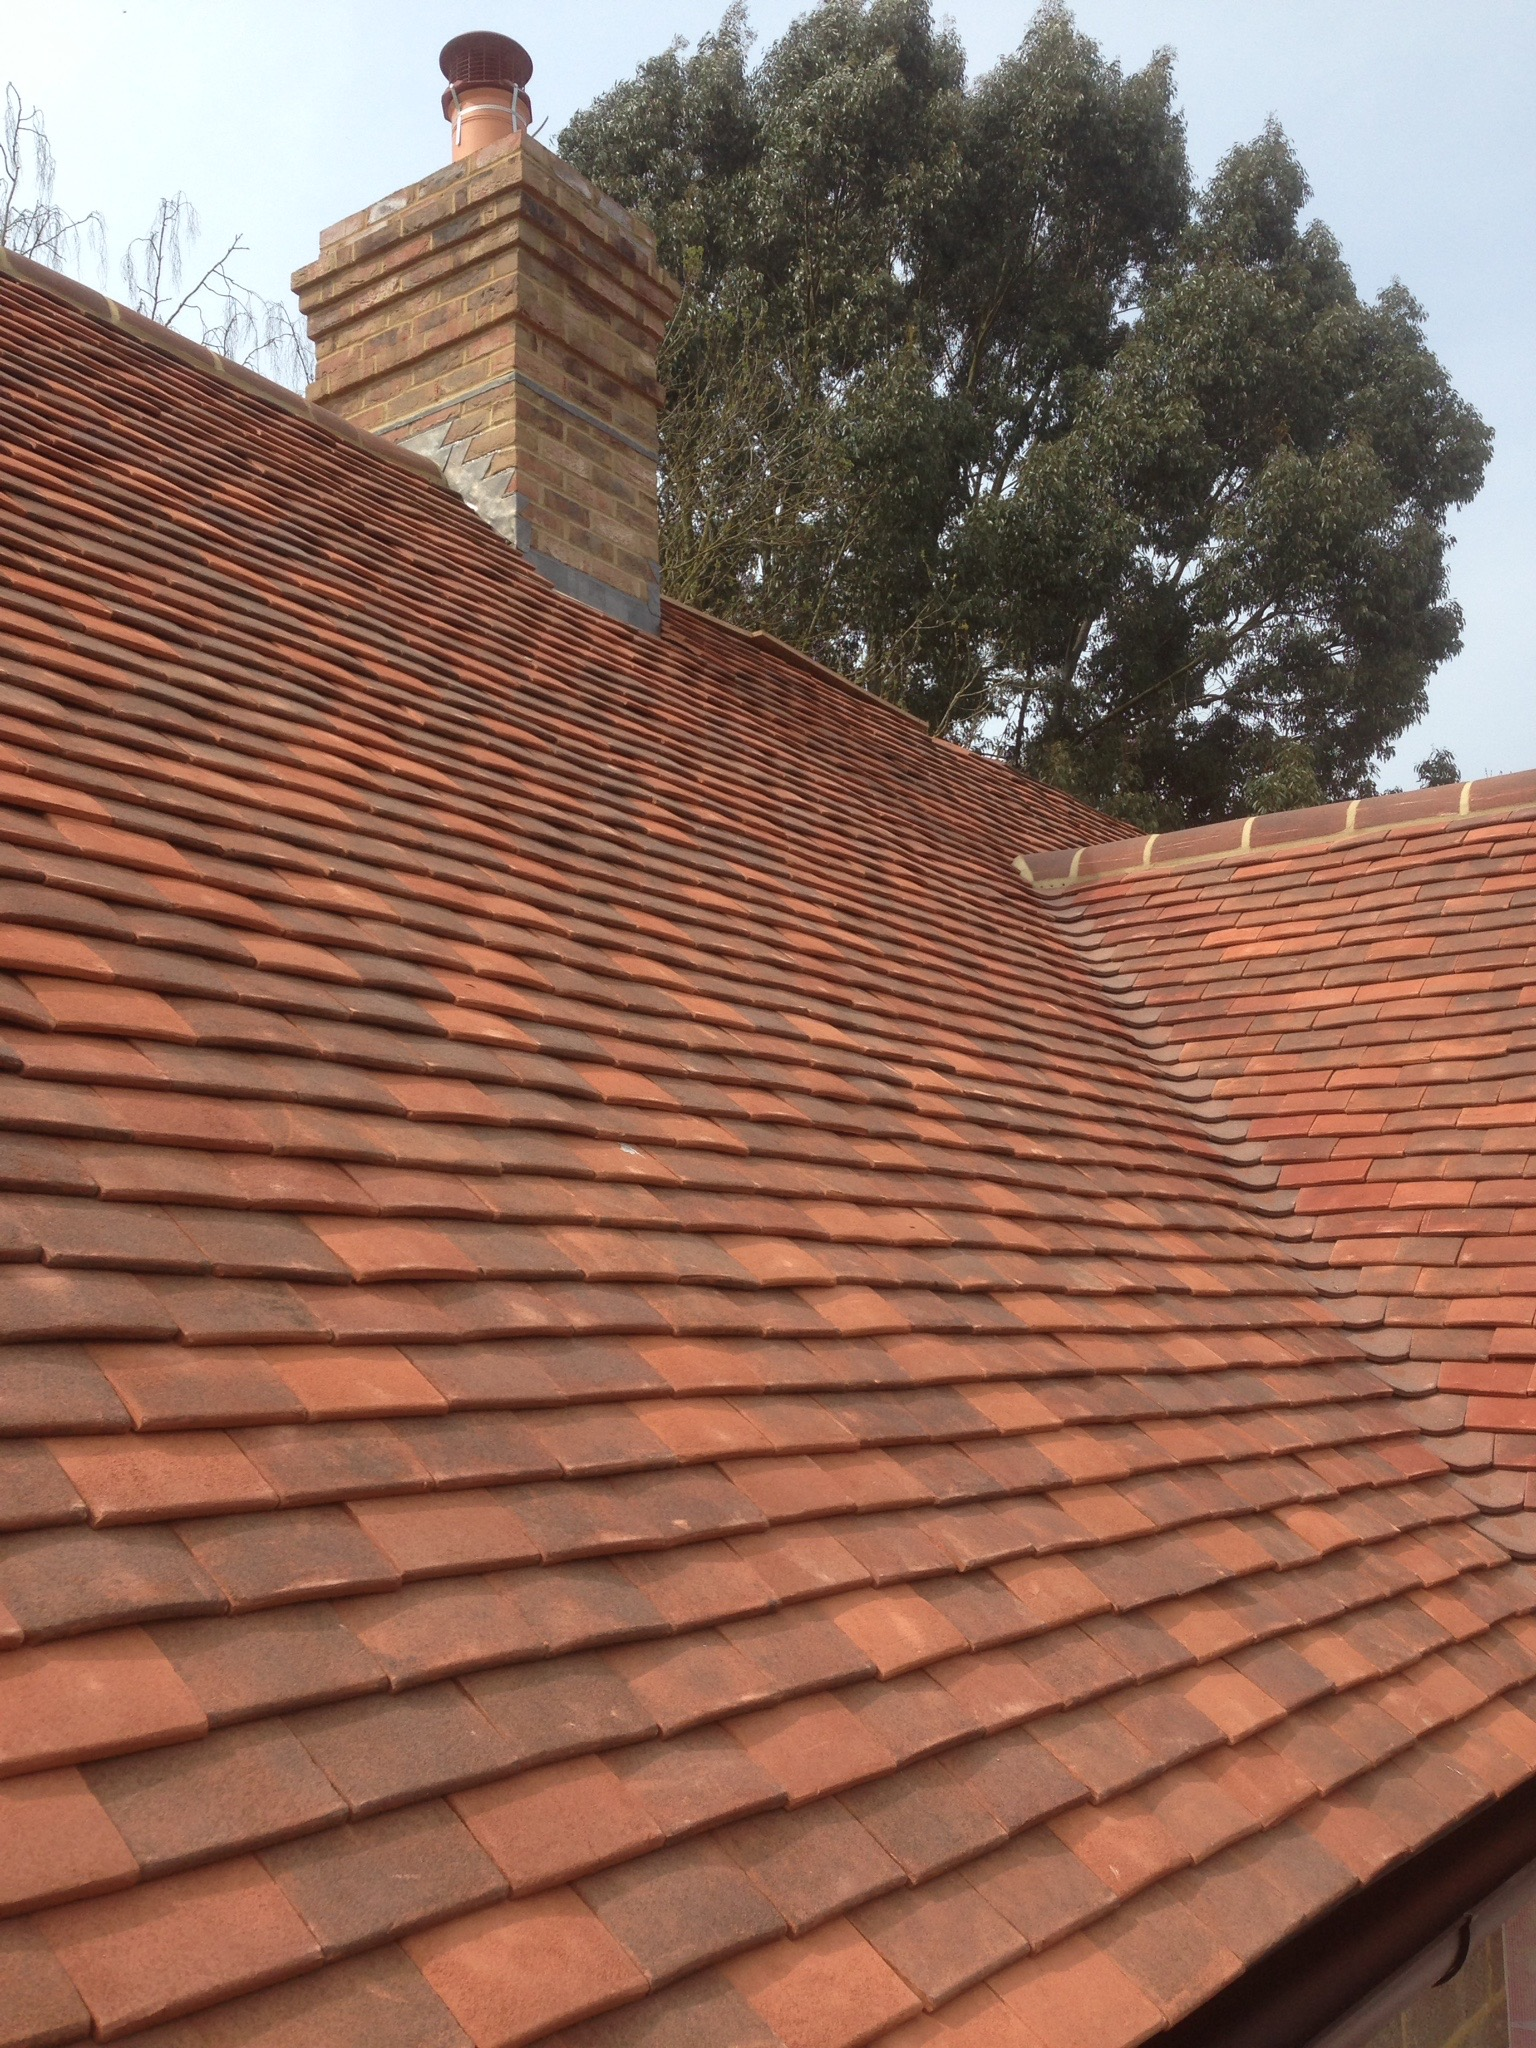 Valleywood Roofing Ltd